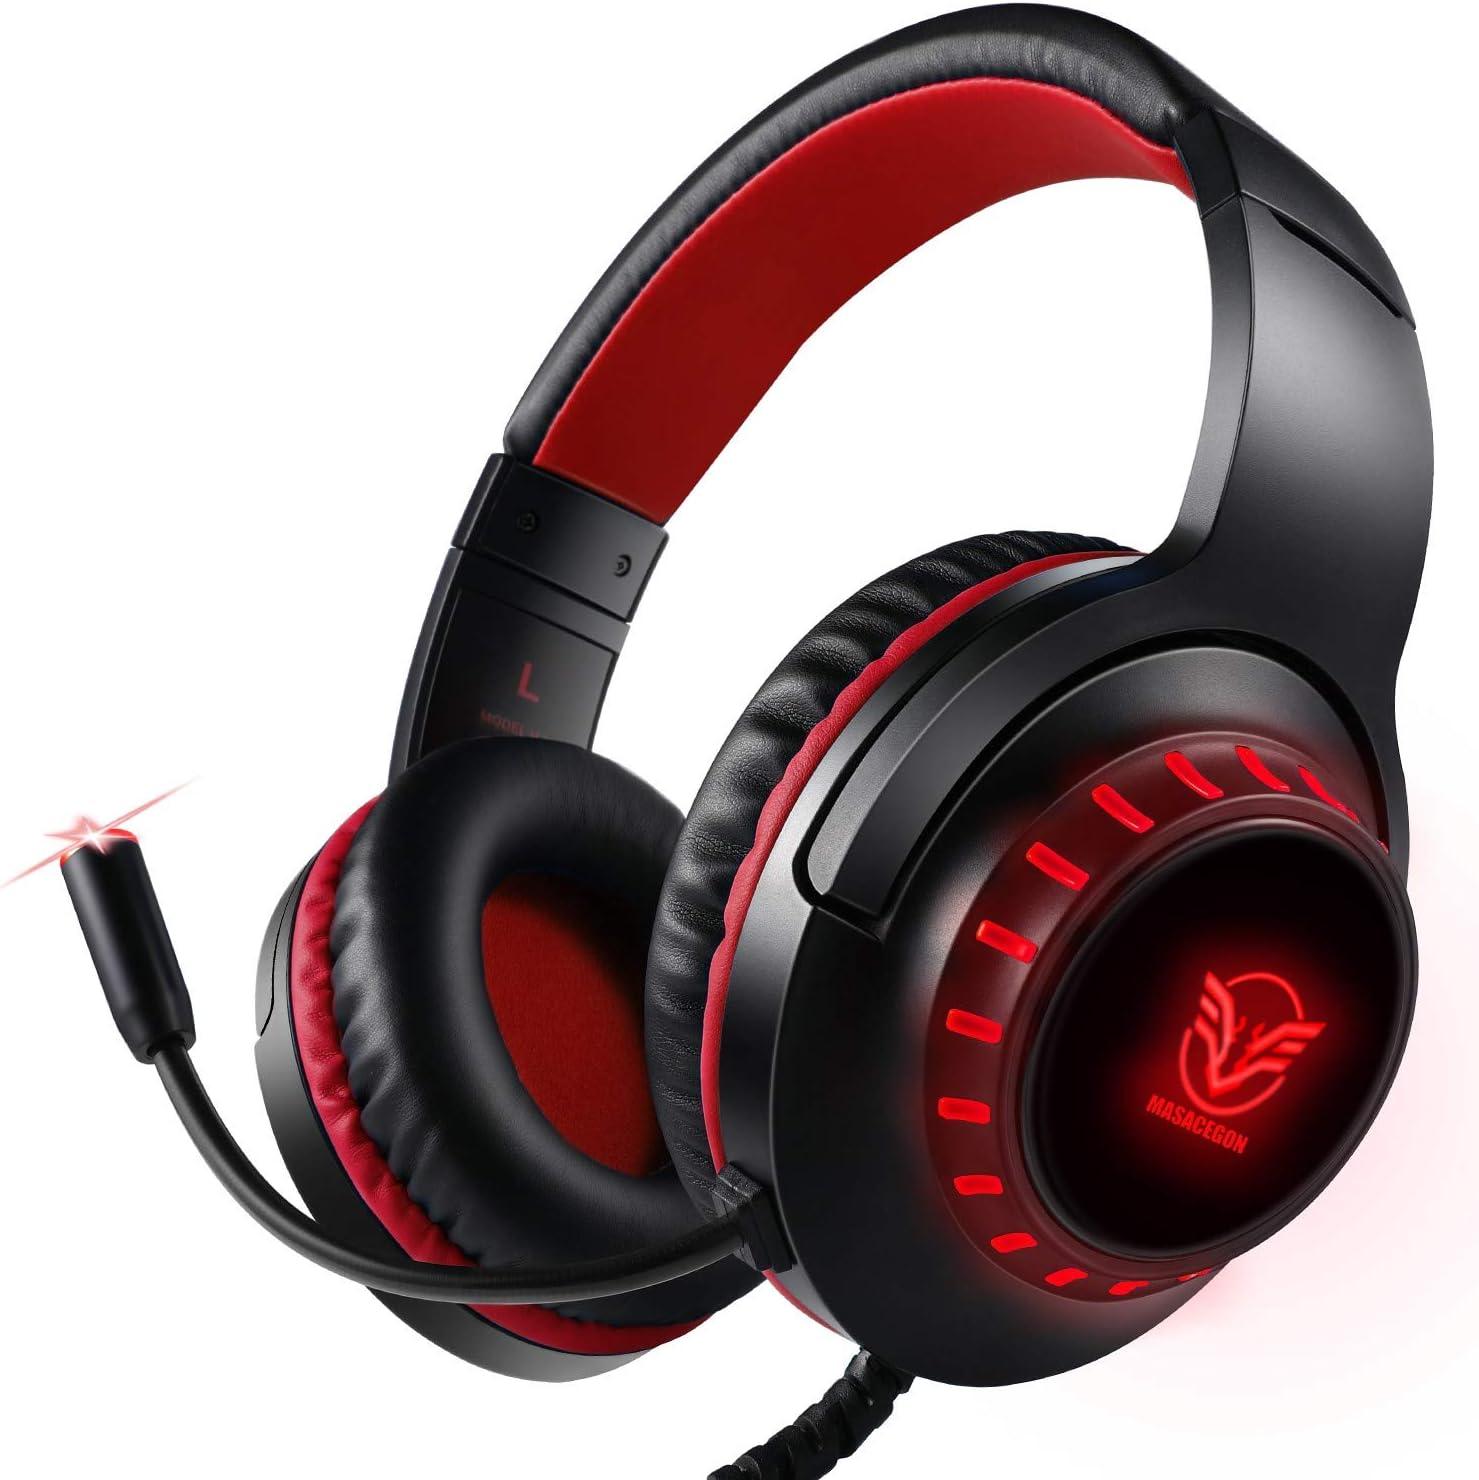 Auriculares para PS4, Surround Bass Sound para Xbox One, PC, Mac, Portátil y Tablet, Pacrate H-11 Auriculares Diadema con 3.5mm Jack con Luz LED